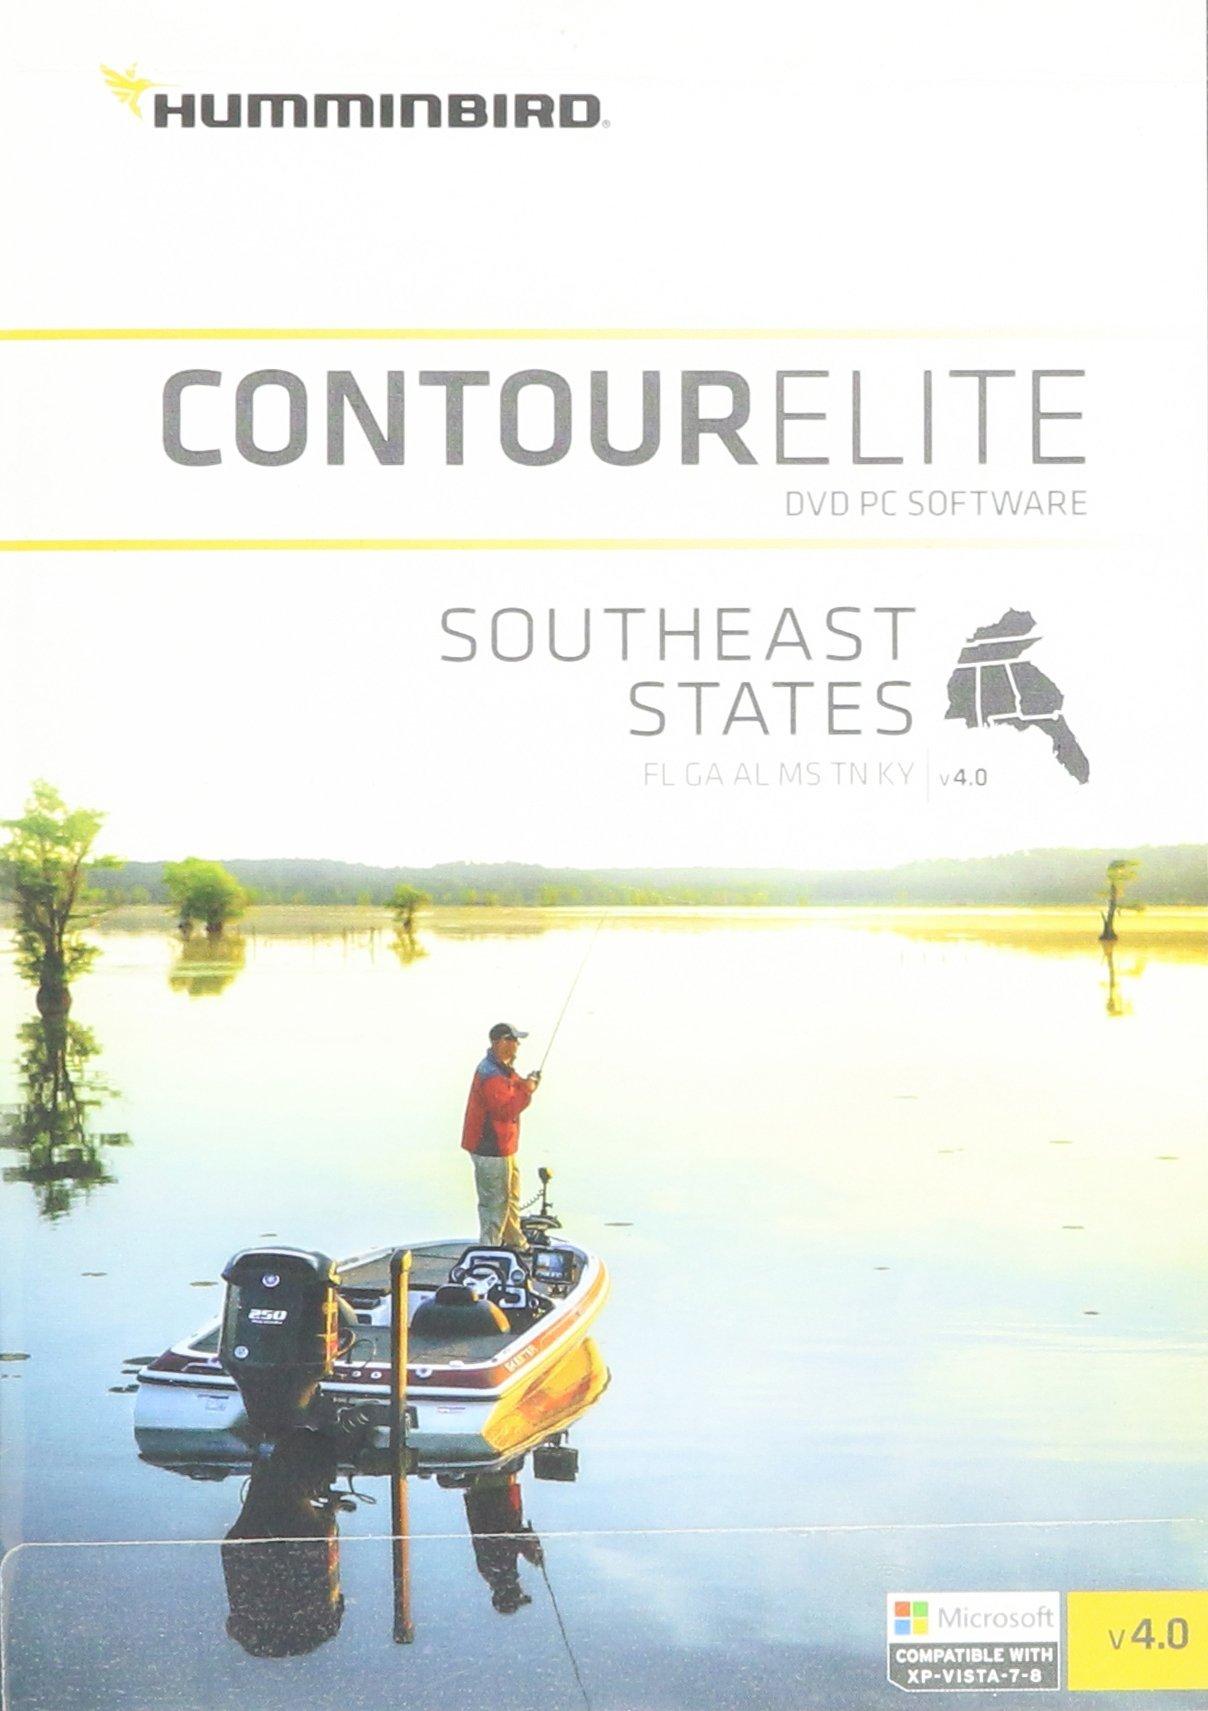 Humminbird Lakemaster 600024-4 Contour Elite- Southeast States Boating Chartplotters (Apr '16)